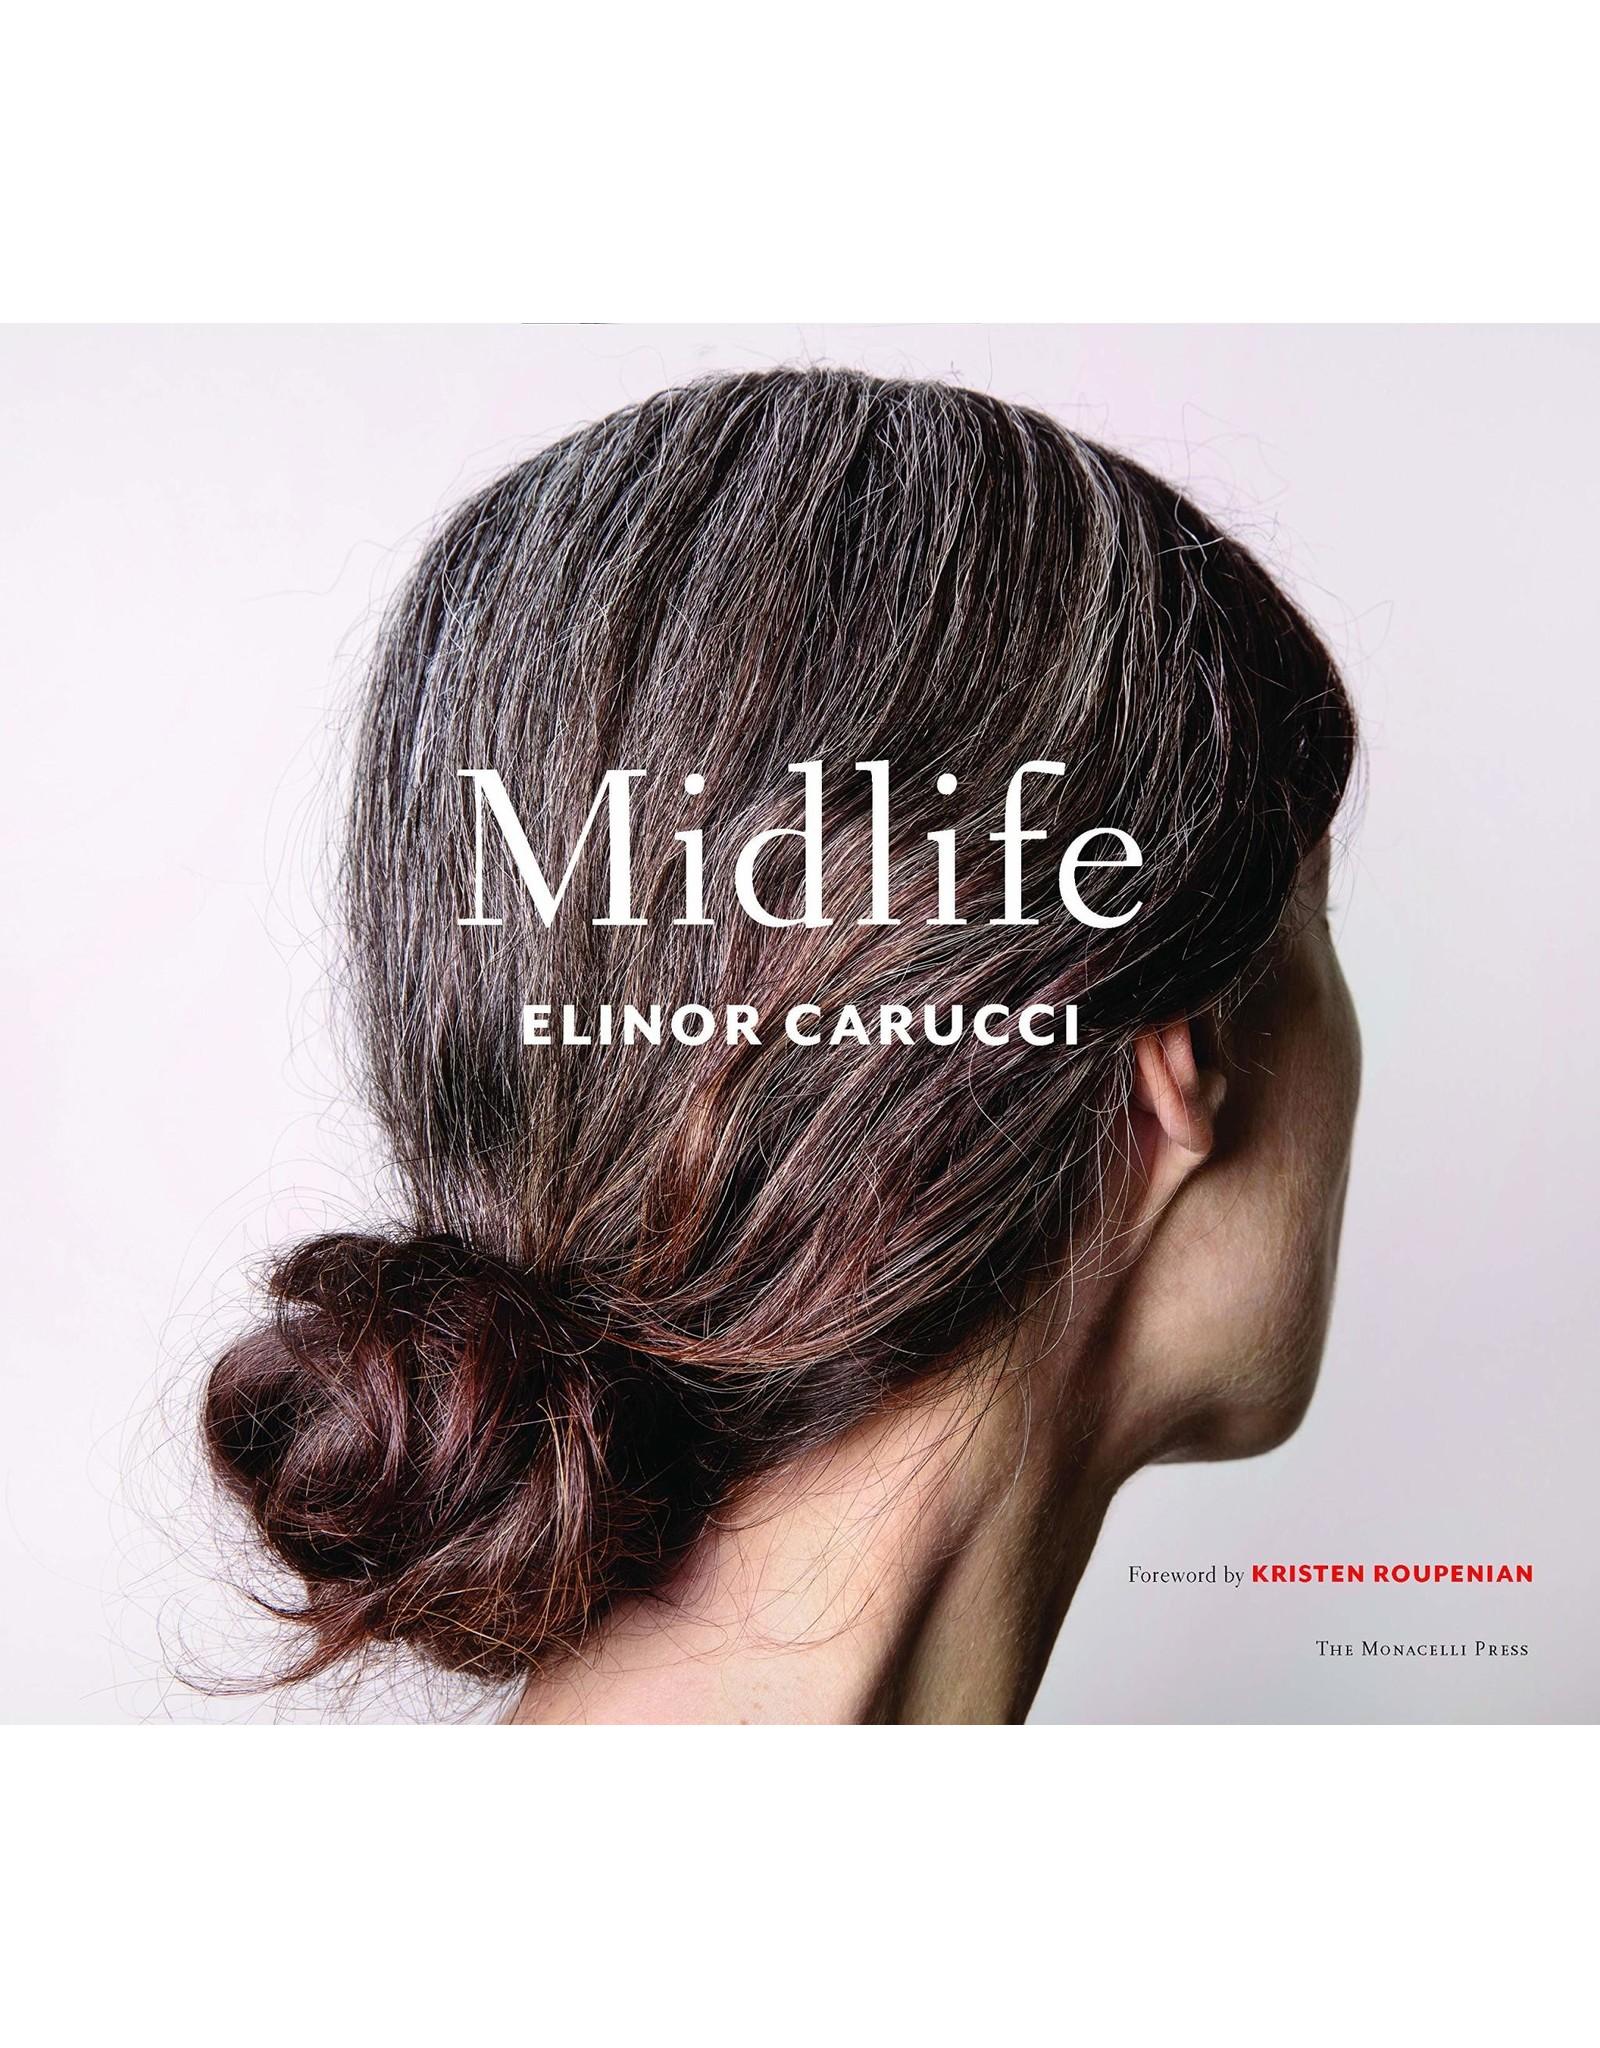 Elinor Carucci: Midlife (Signed)